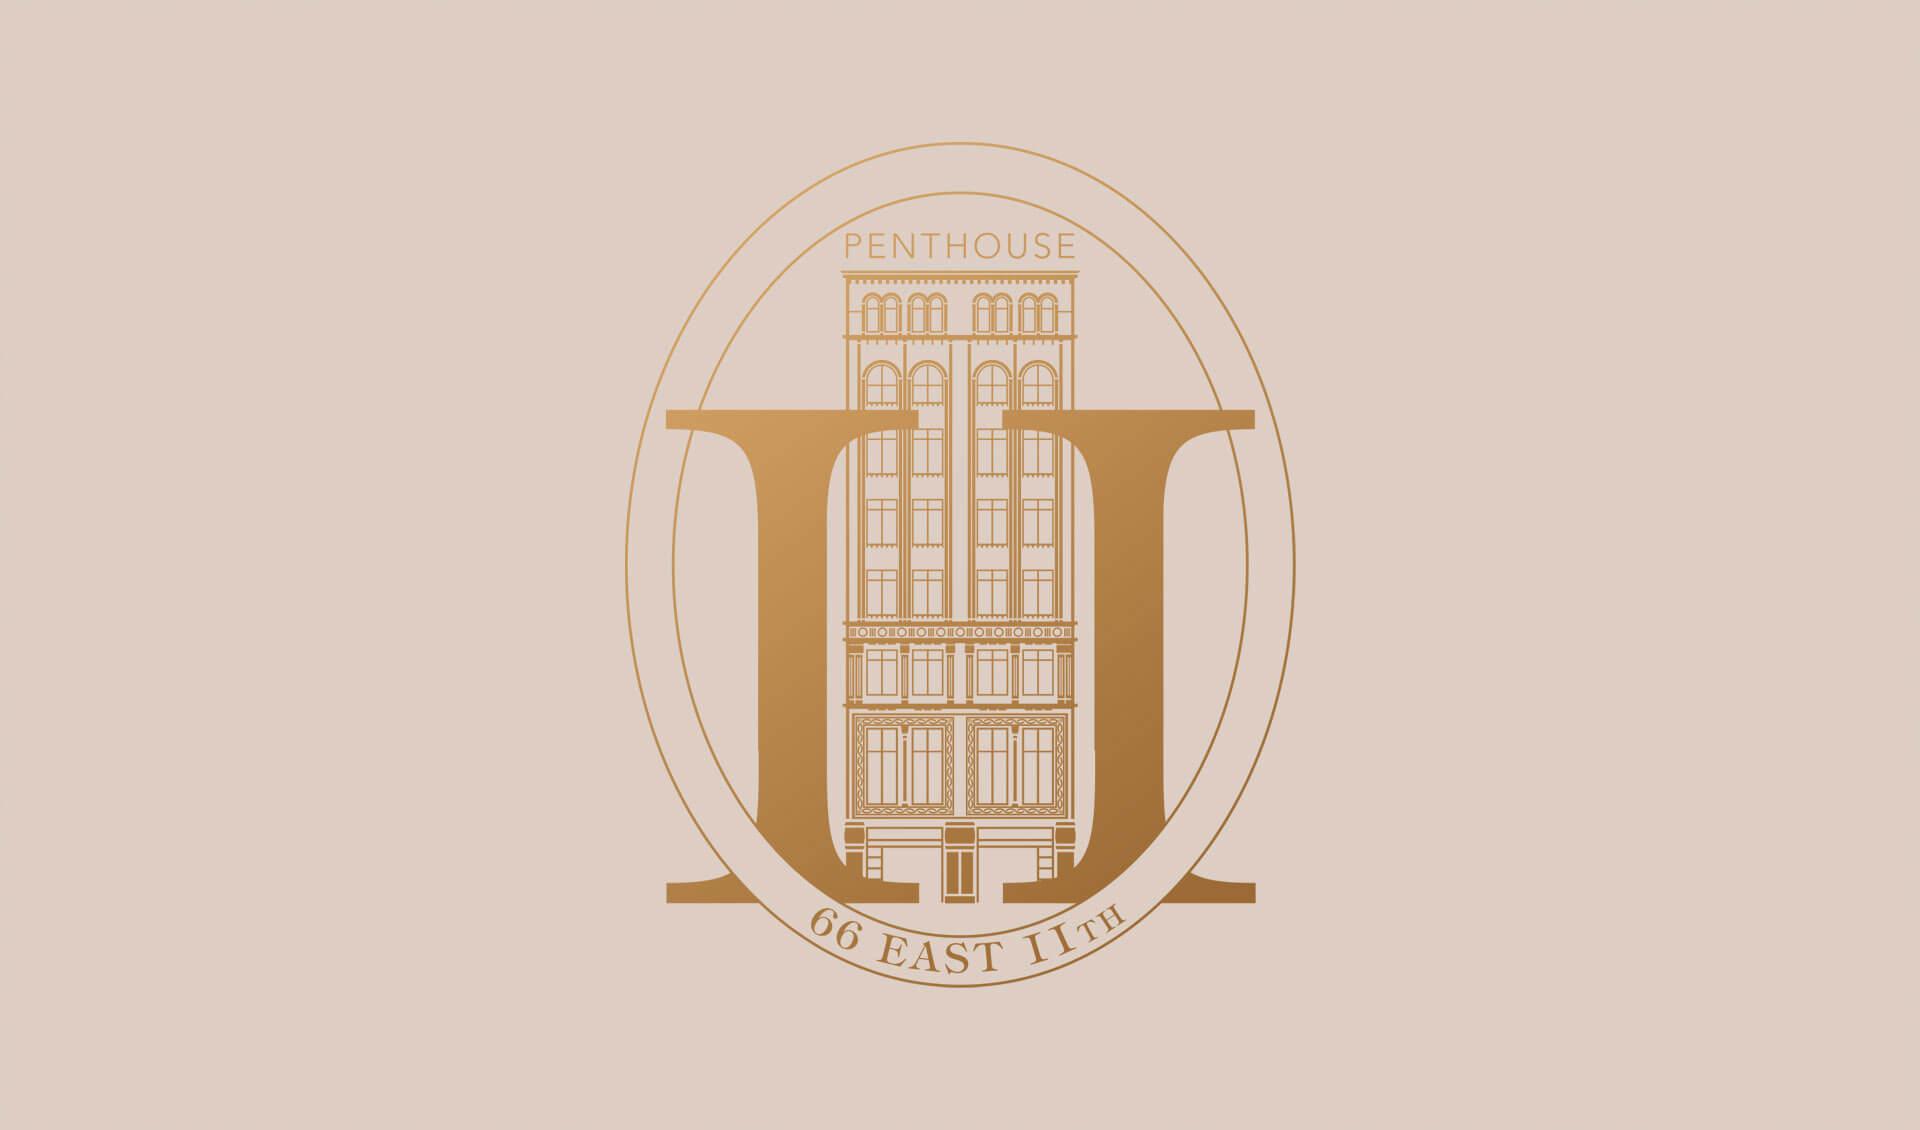 66 East 11th Logo Crest